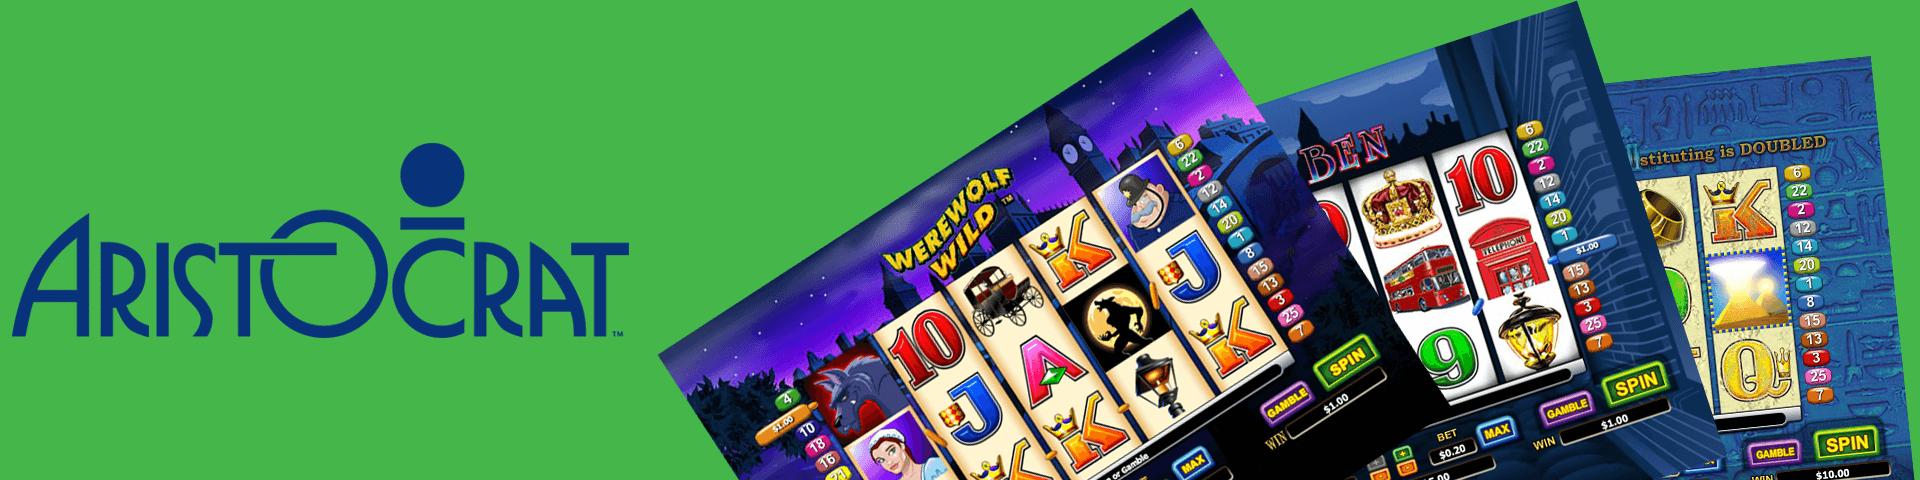 jocuri-casino-Aristocrat-multabafta-slider